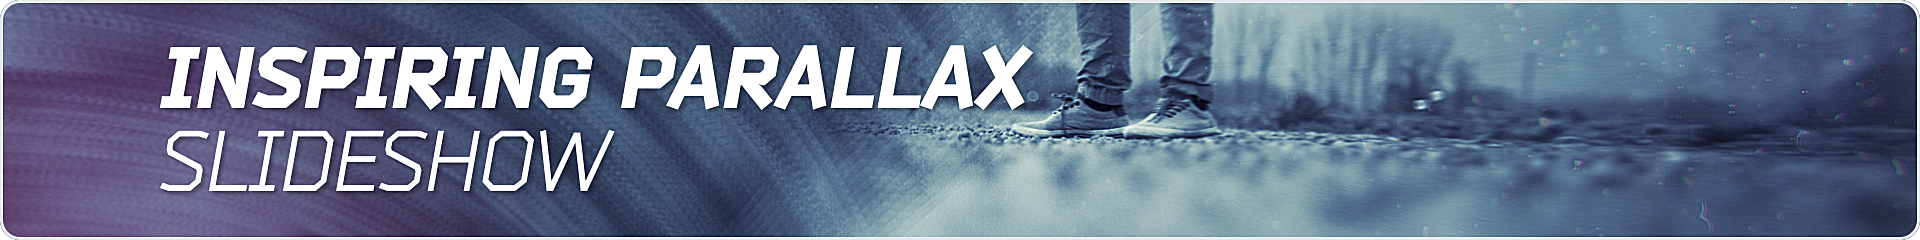 Parallax Epic Slideshow - 7